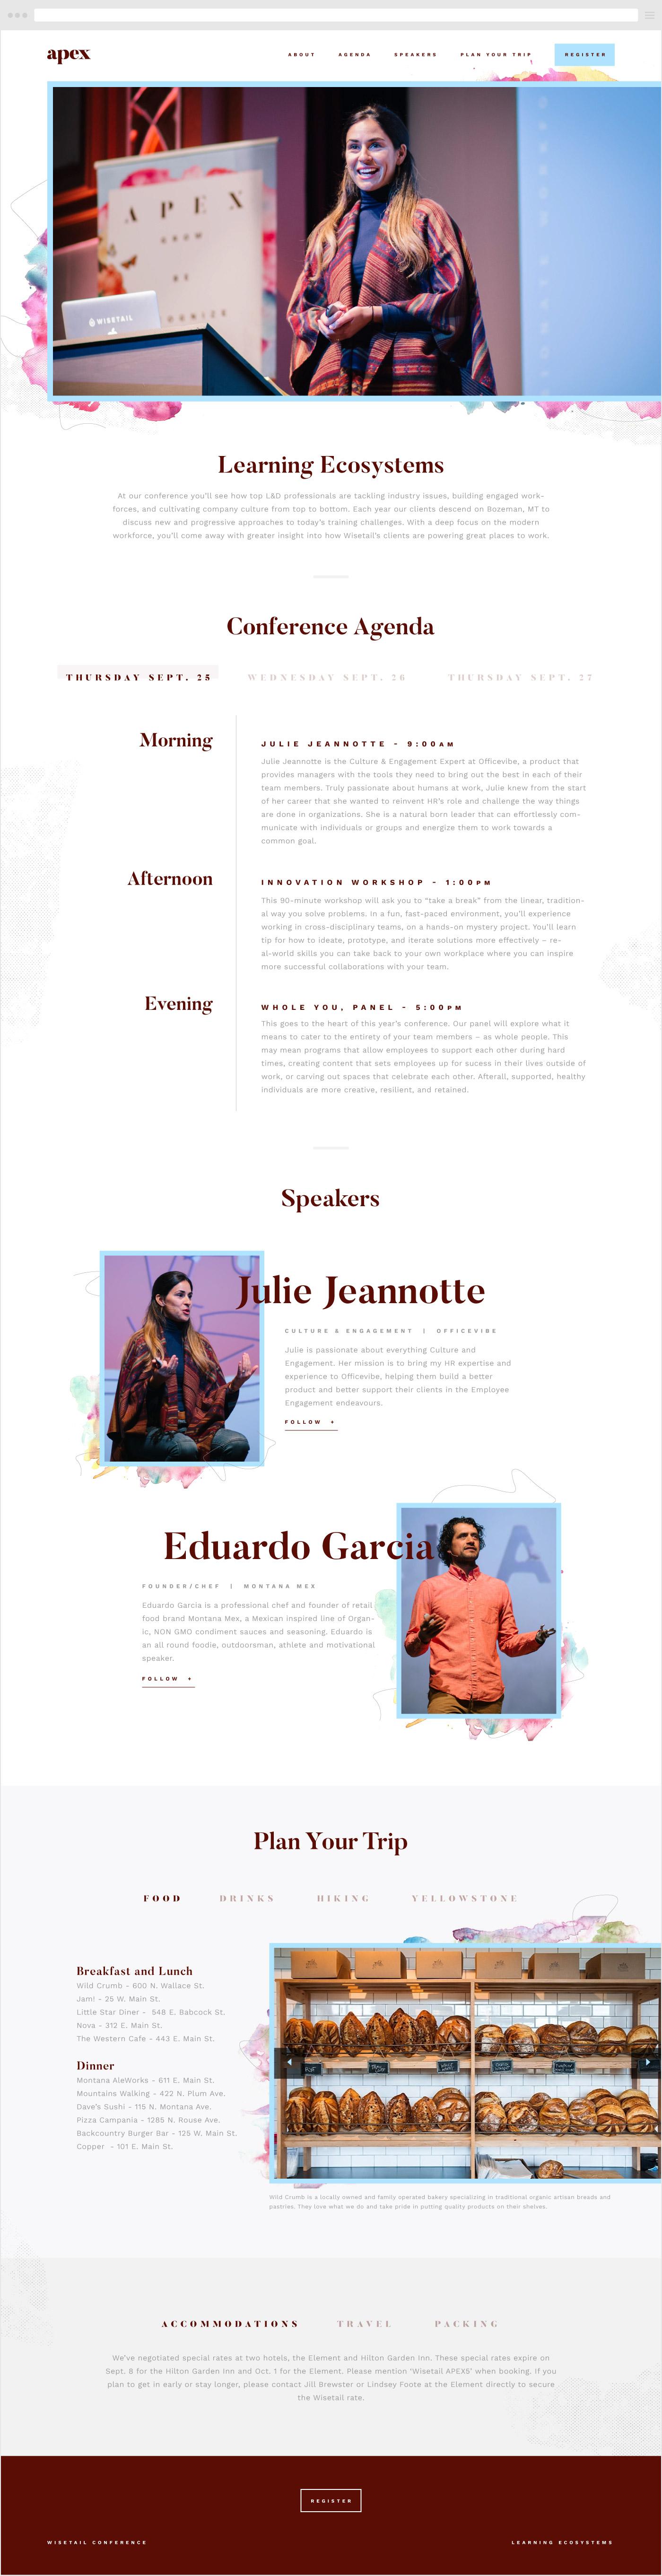 raymond-lombardi-design-apex-conference-website.jpg